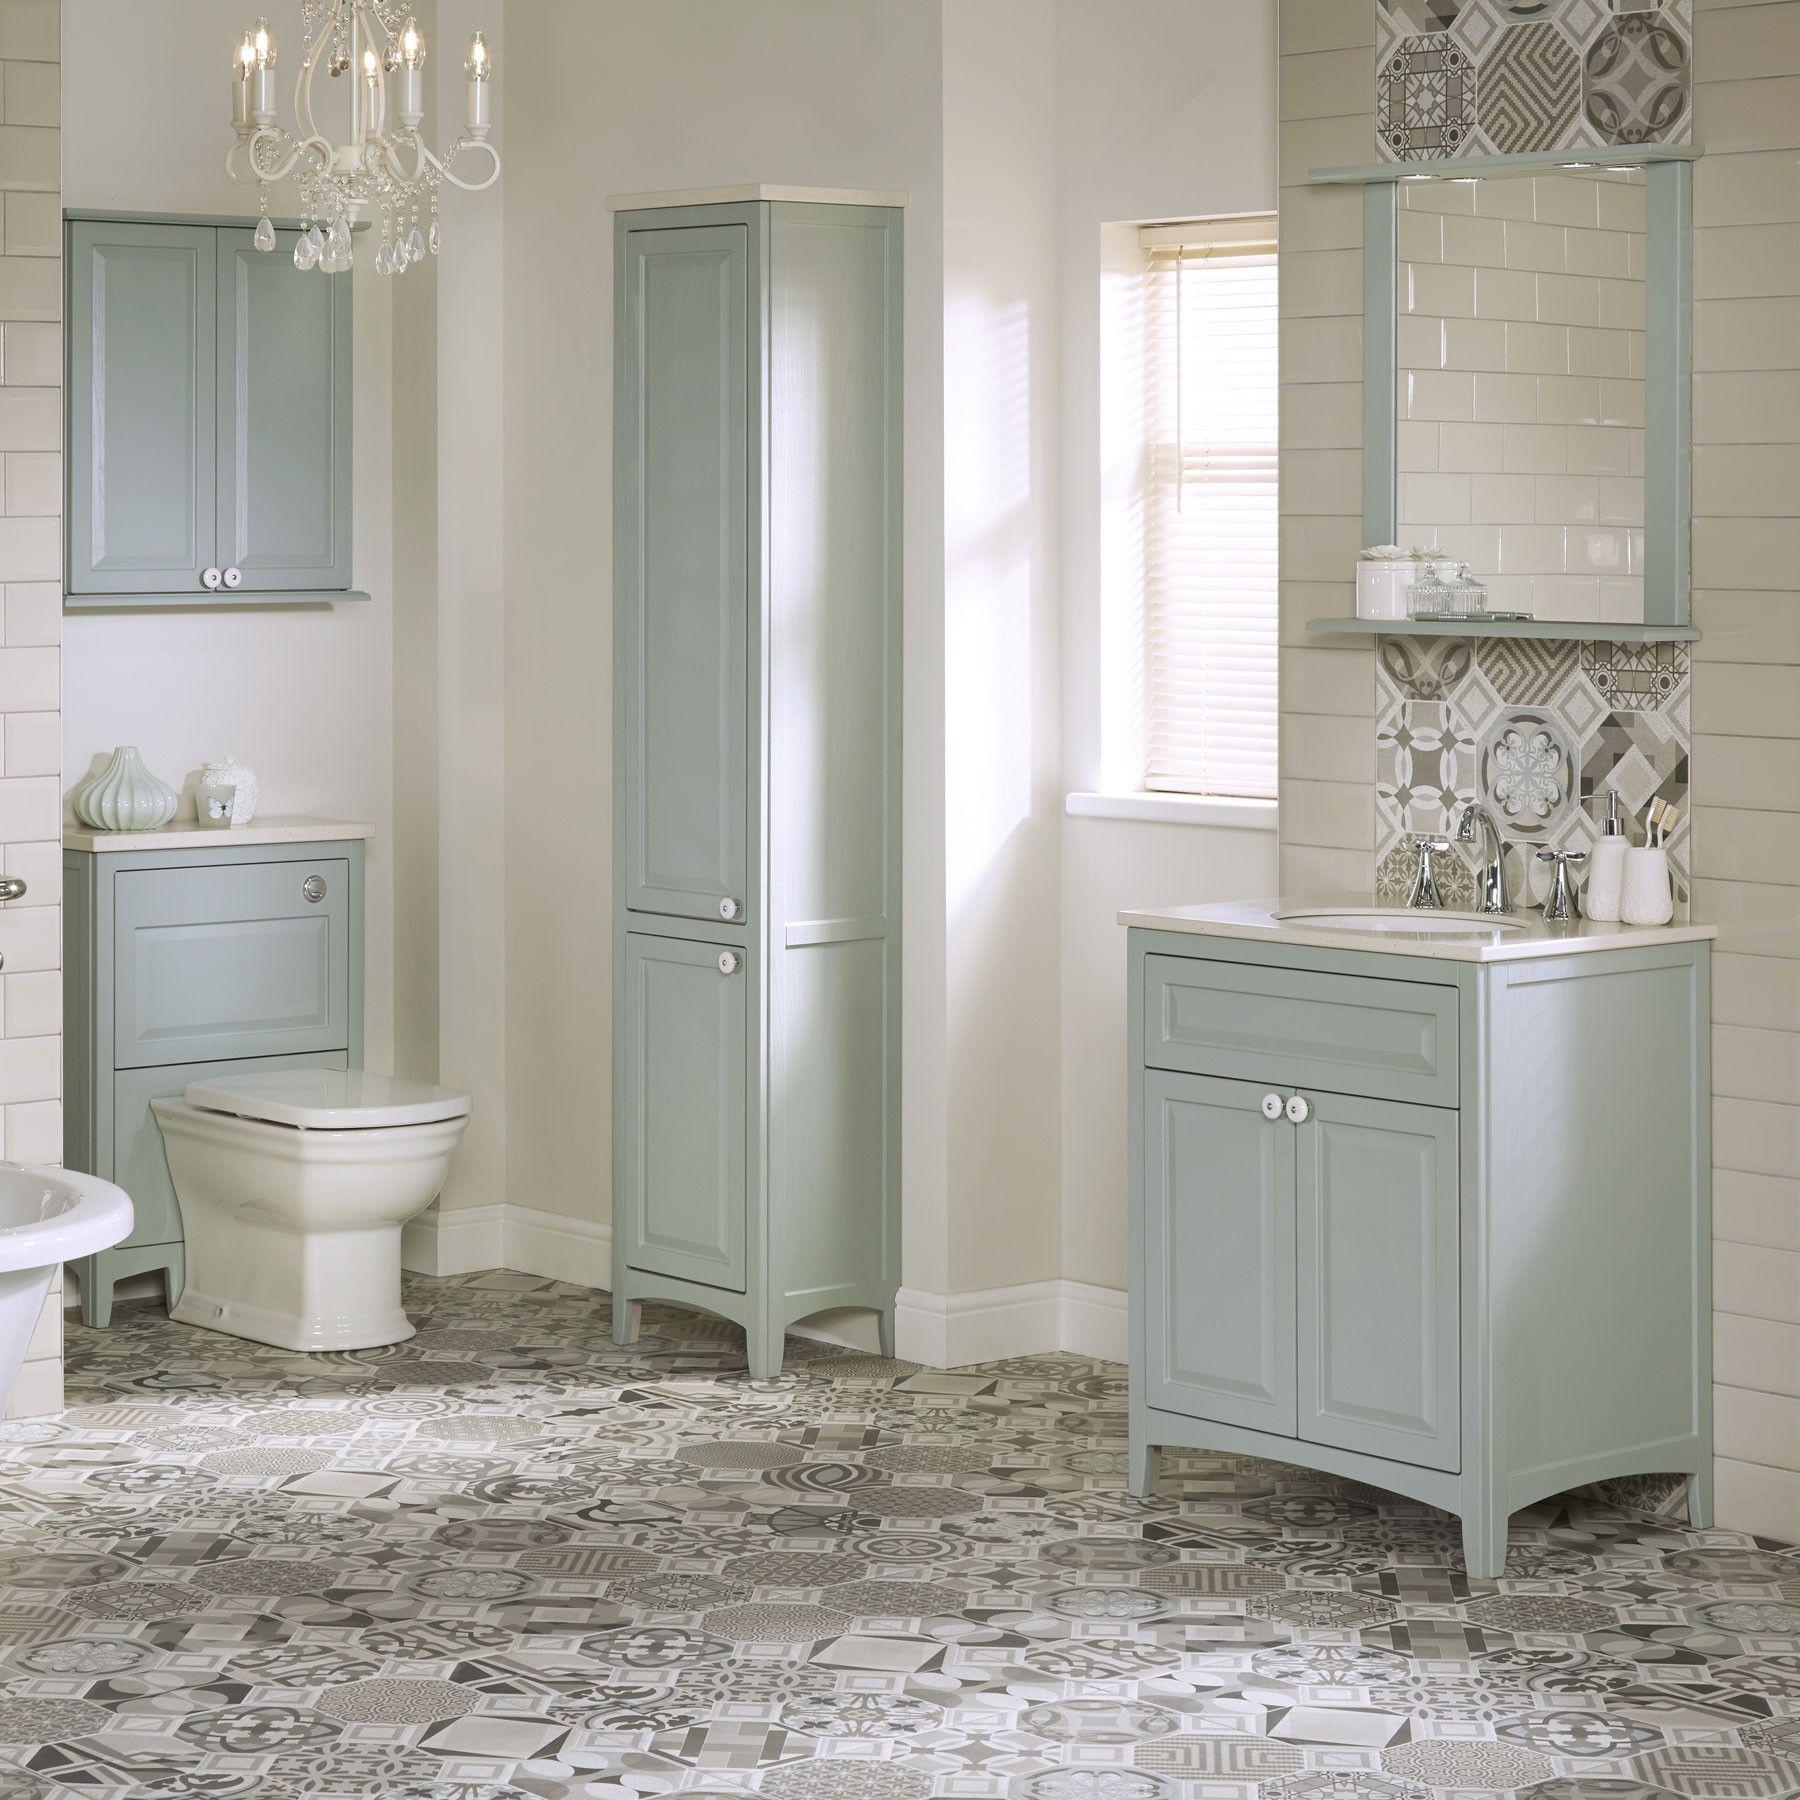 Utopia Downtown Range Fitted Bathroom Furniture Traditional Bathroom Furniture Freestanding Bathroom Furniture